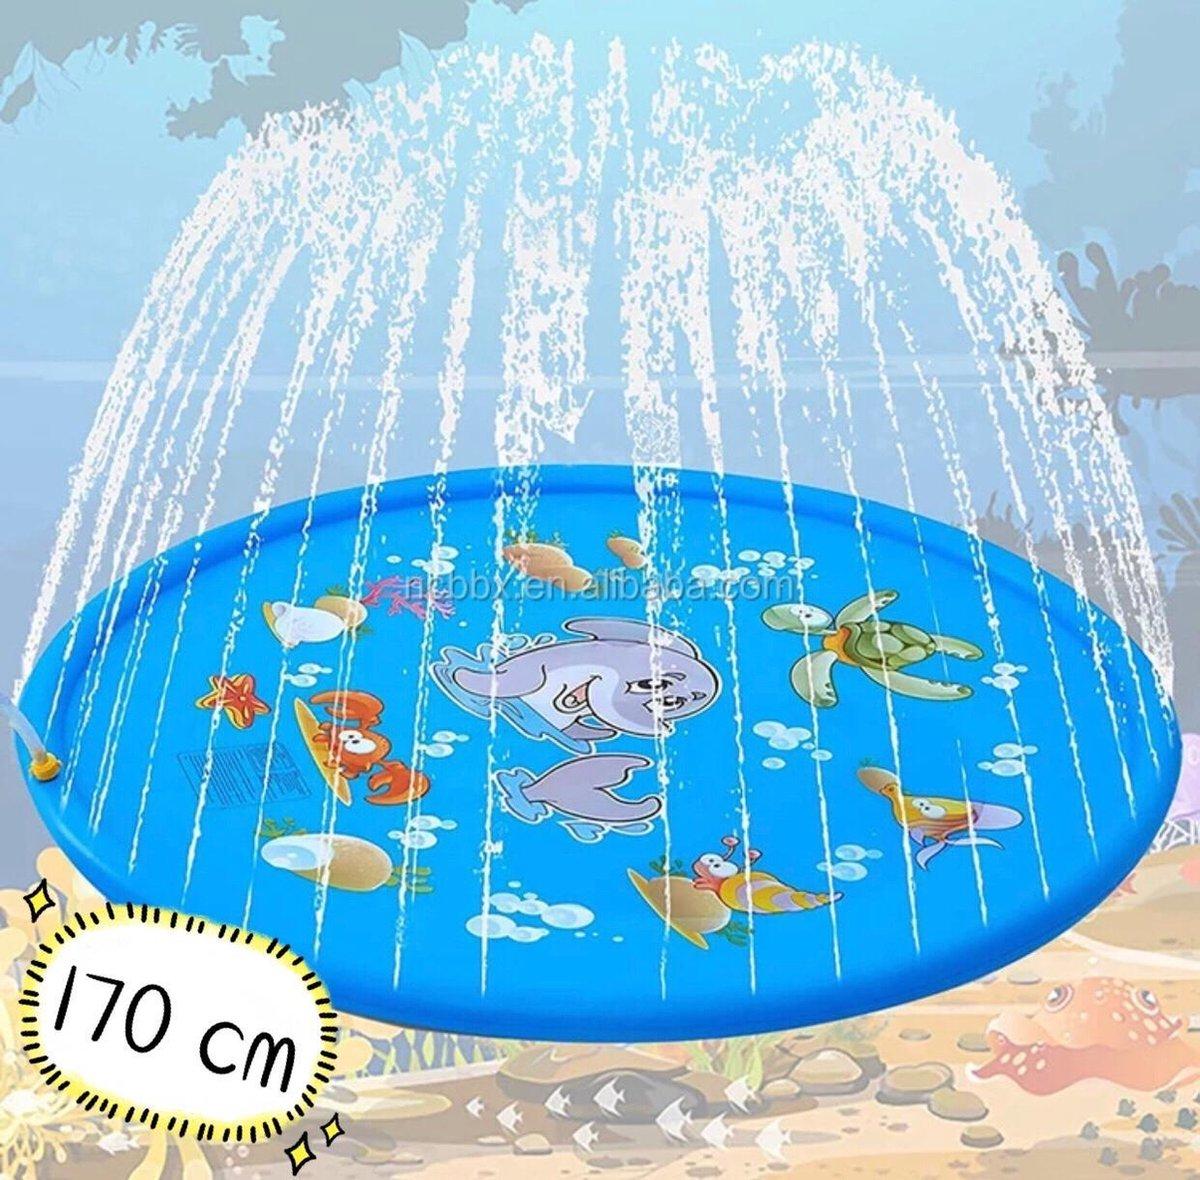 Water spray mat 170cm - water speelgoed - zomer speelgoed - opblaasbaar